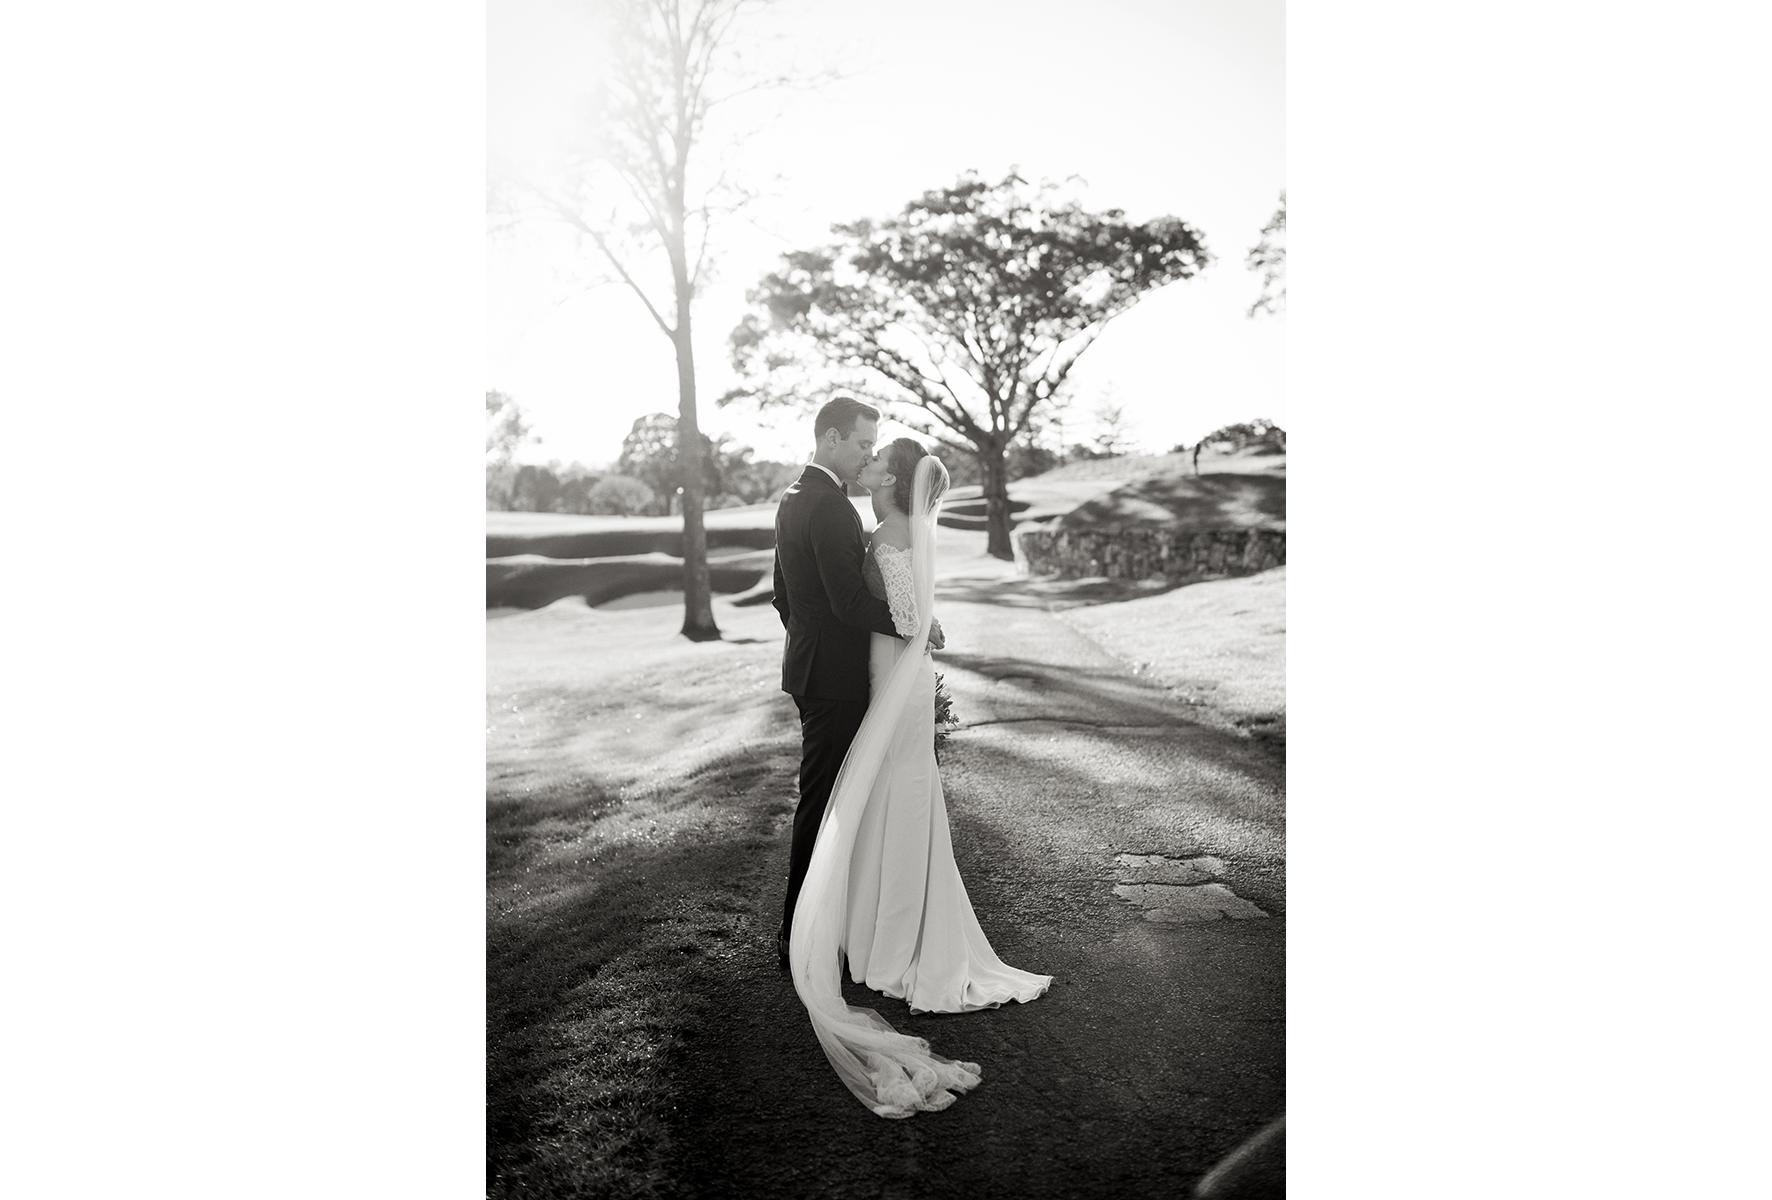 raquelreis_wedding_photography_apawamisclub_047.png